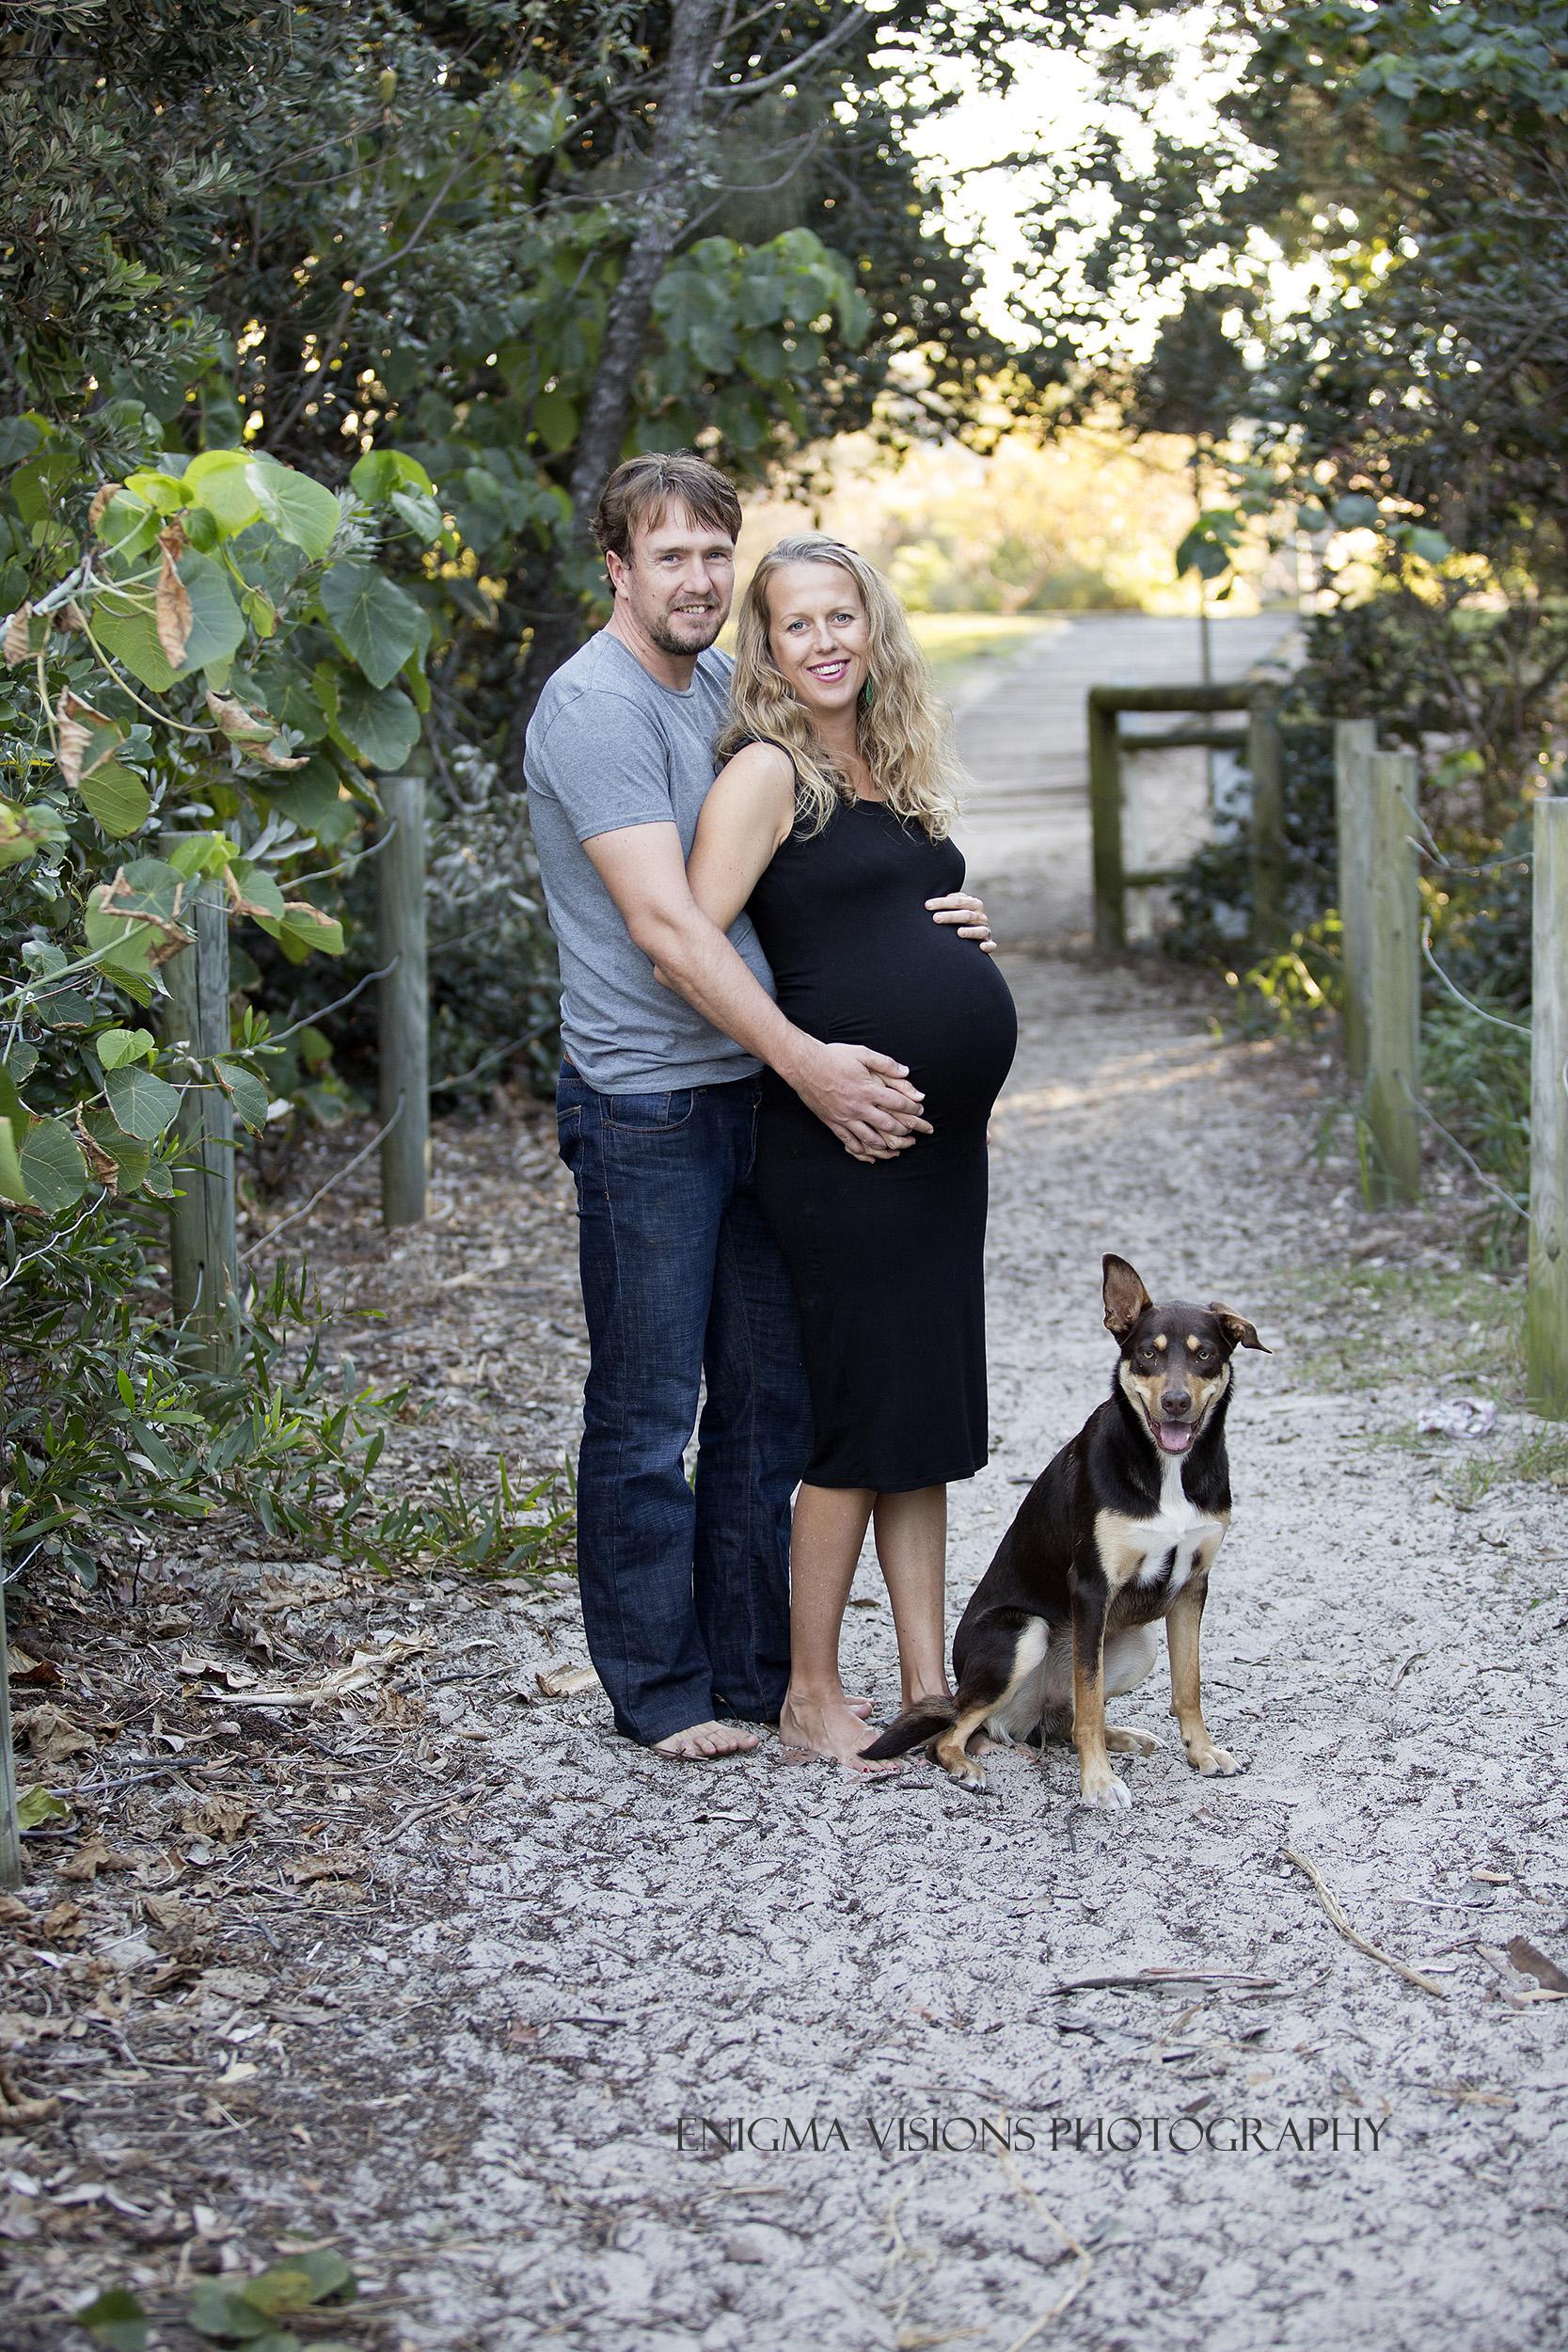 enigma_visions_photography_maternity_melandandrew_kingscliff (9).jpg